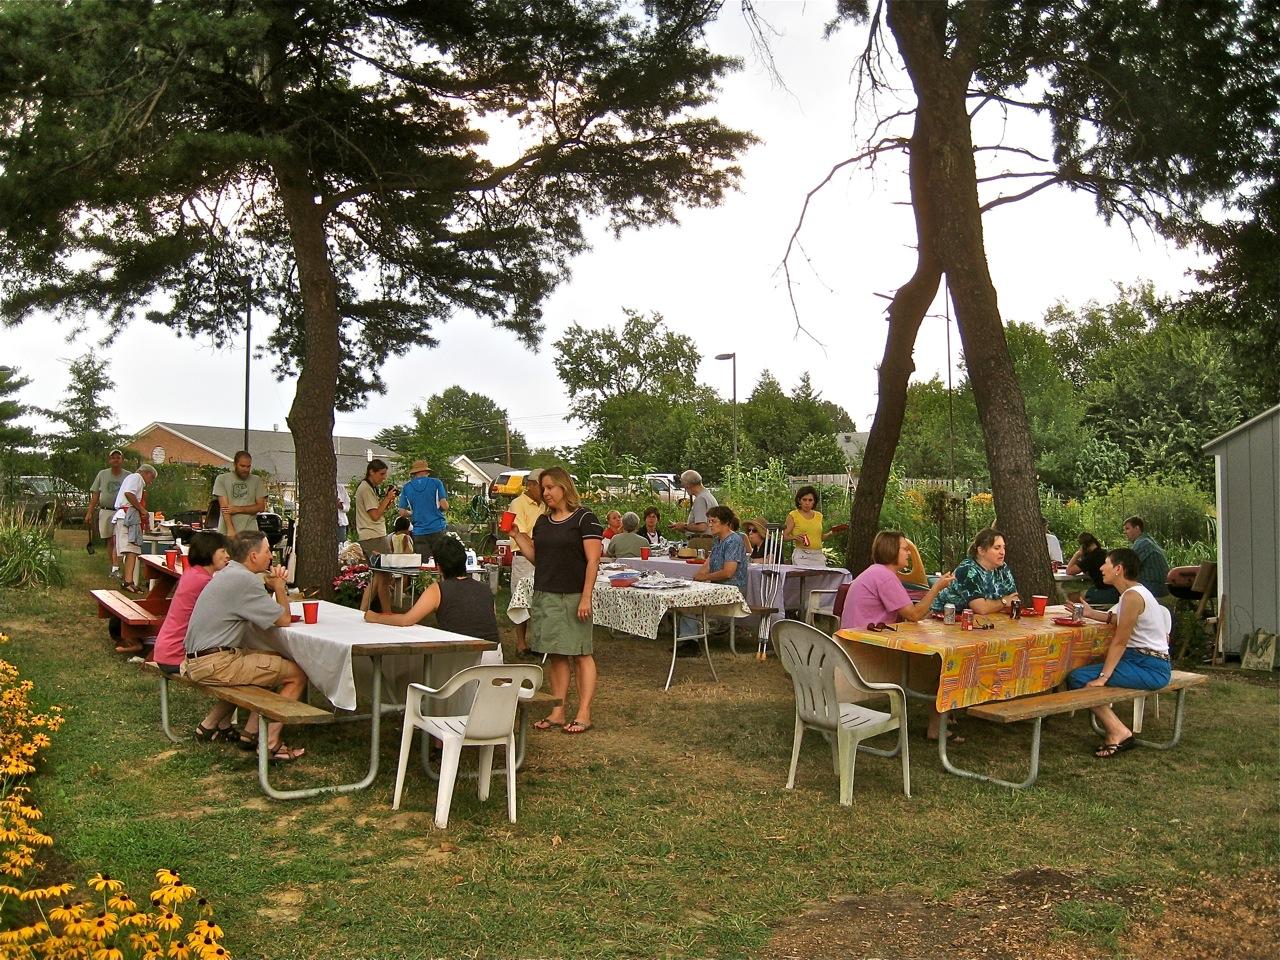 Community Gardens Environment